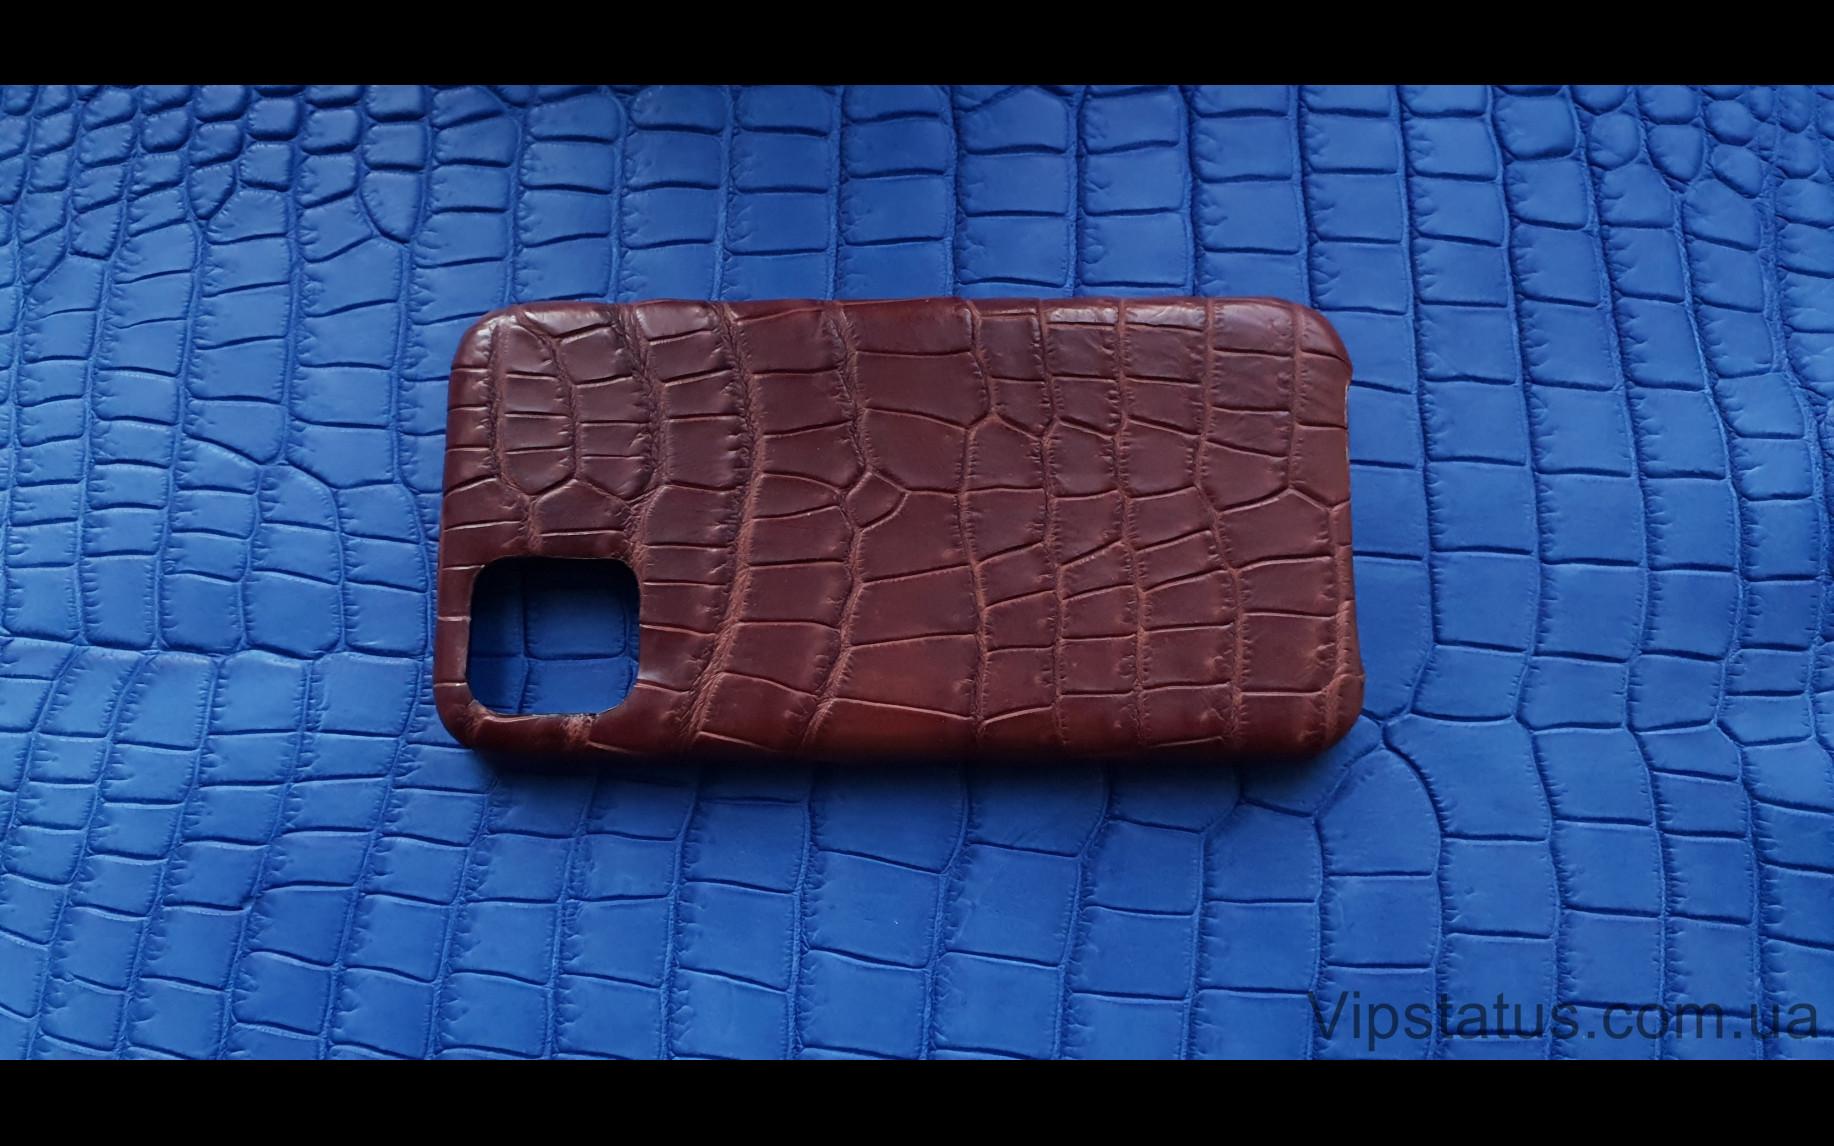 Elite Rich Crocodile Эксклюзивный чехол IPhone 11 Pro Max Rich Crocodile Exclusive case IPhone 11 Pro Max Crocodile leather image 4